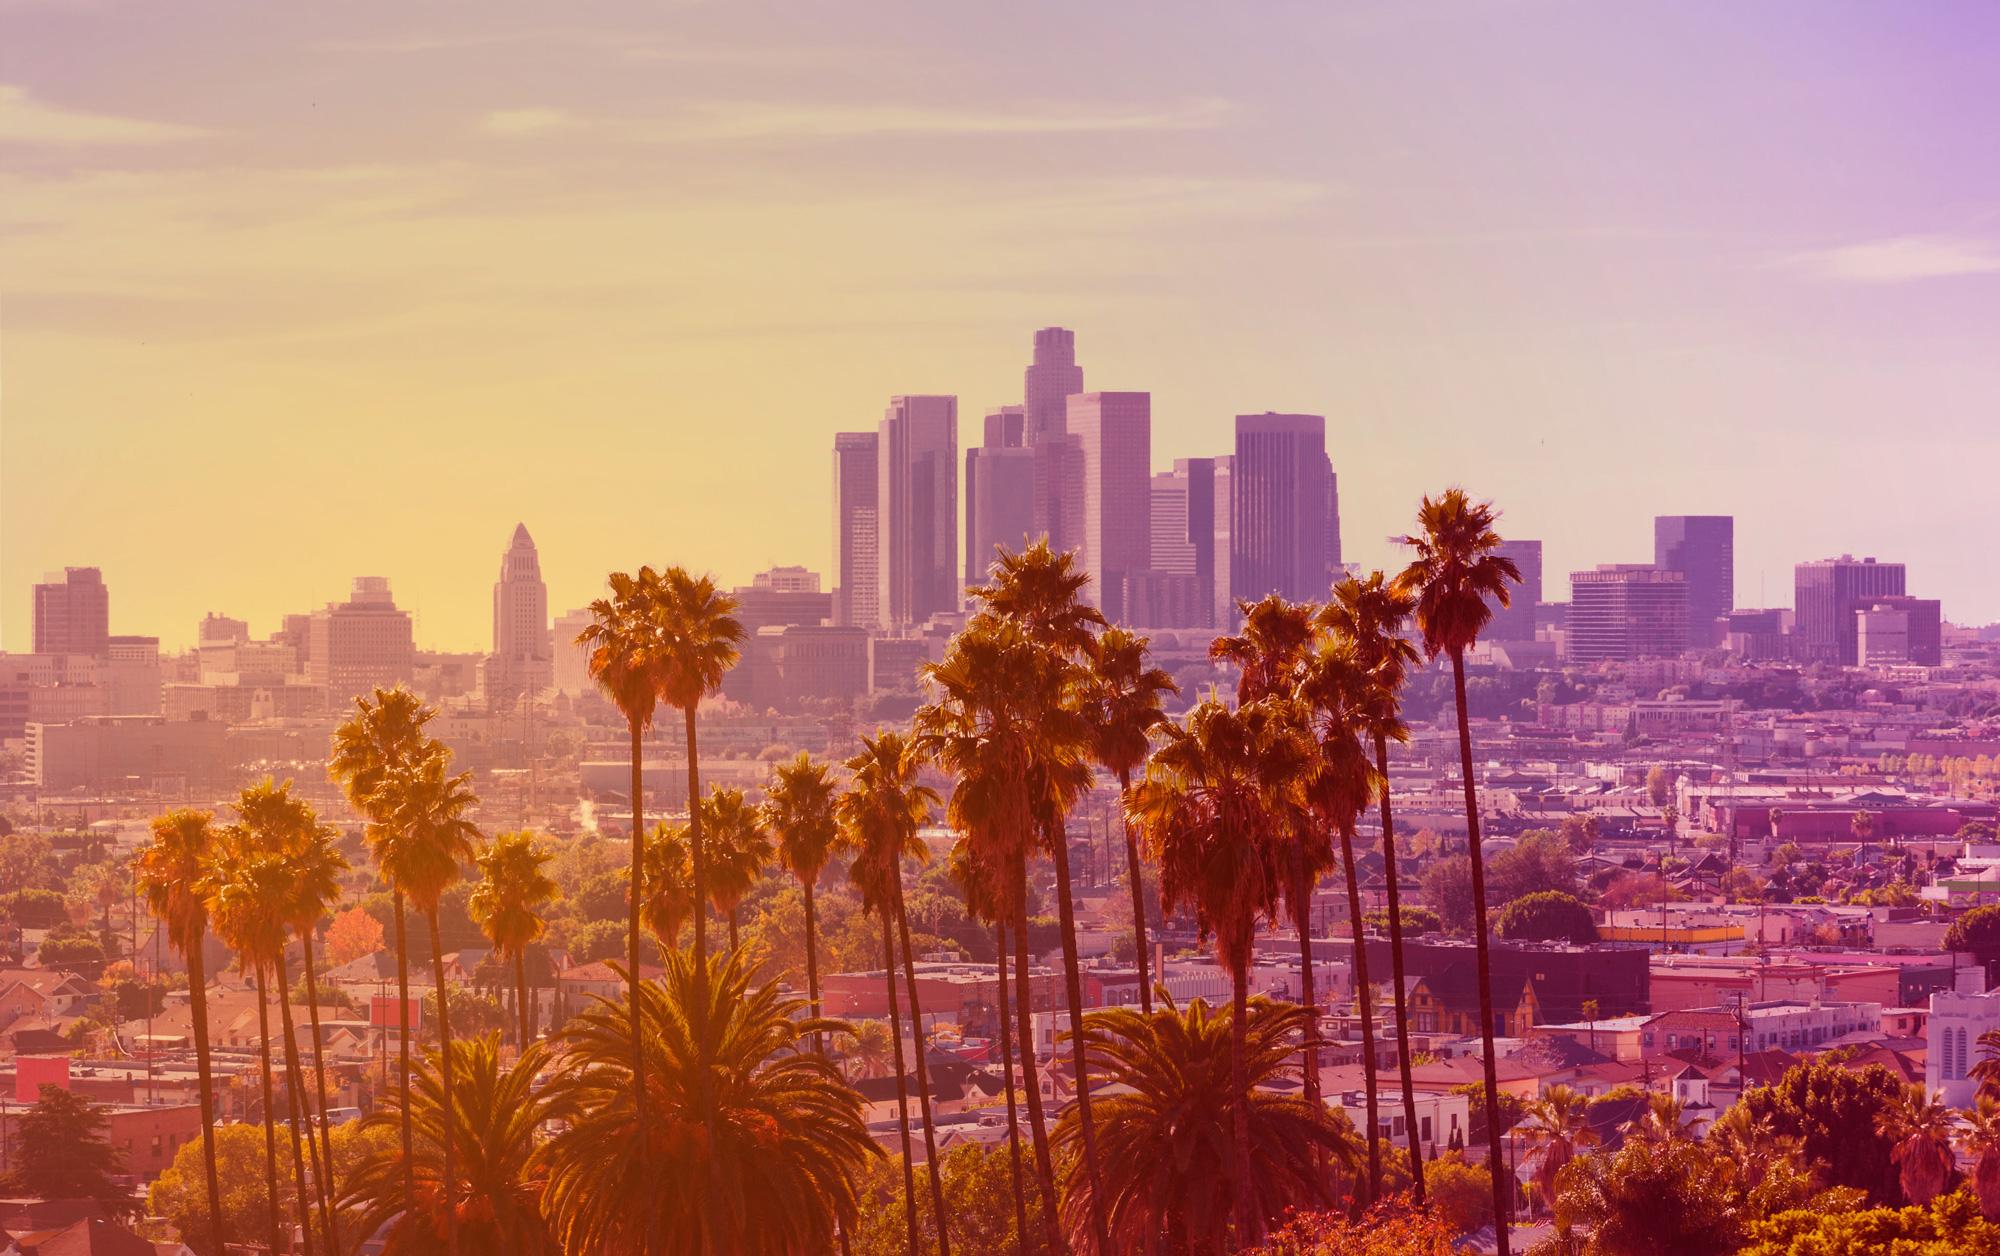 LA-City-Vibe-FINAL-2000